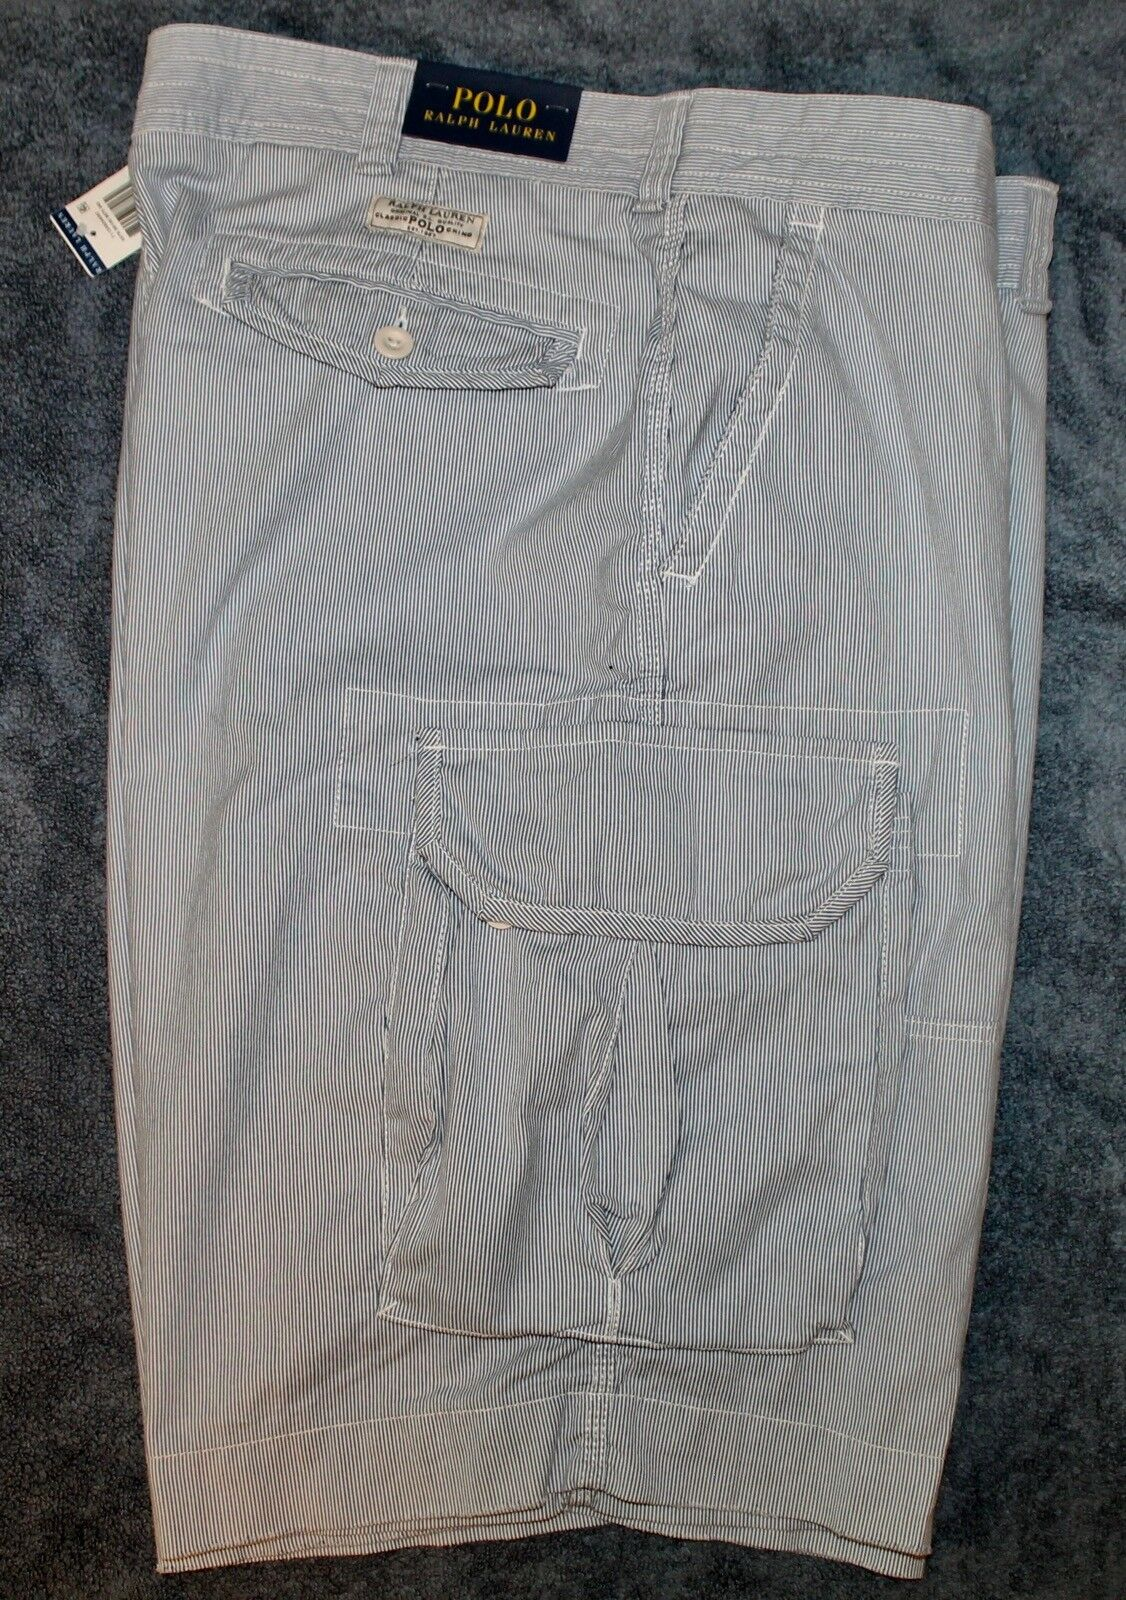 Polo Ralph Lauren Mens White bluee Striped Cotton Cargo Shorts NWT Waist 32